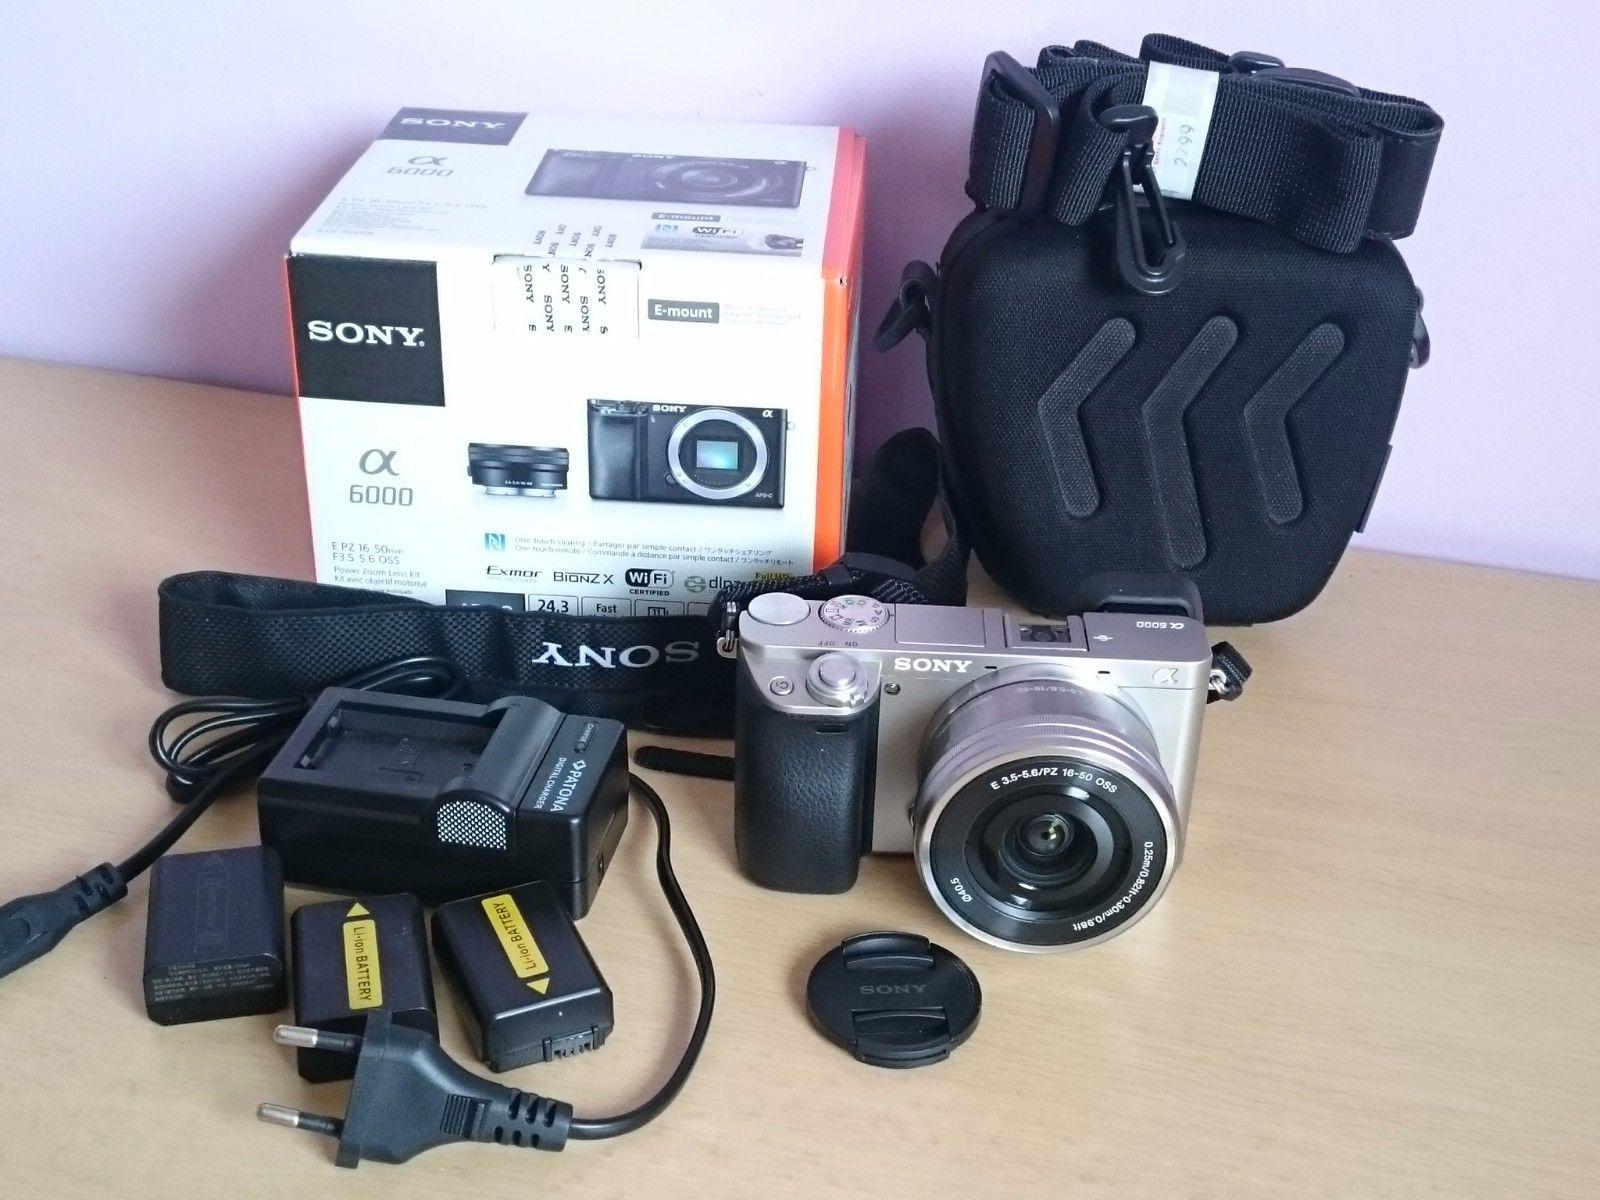 Sony Alpha A6000 1650 Kit in neuwertigem Zustand (wie Neu)  mit OVP Paket